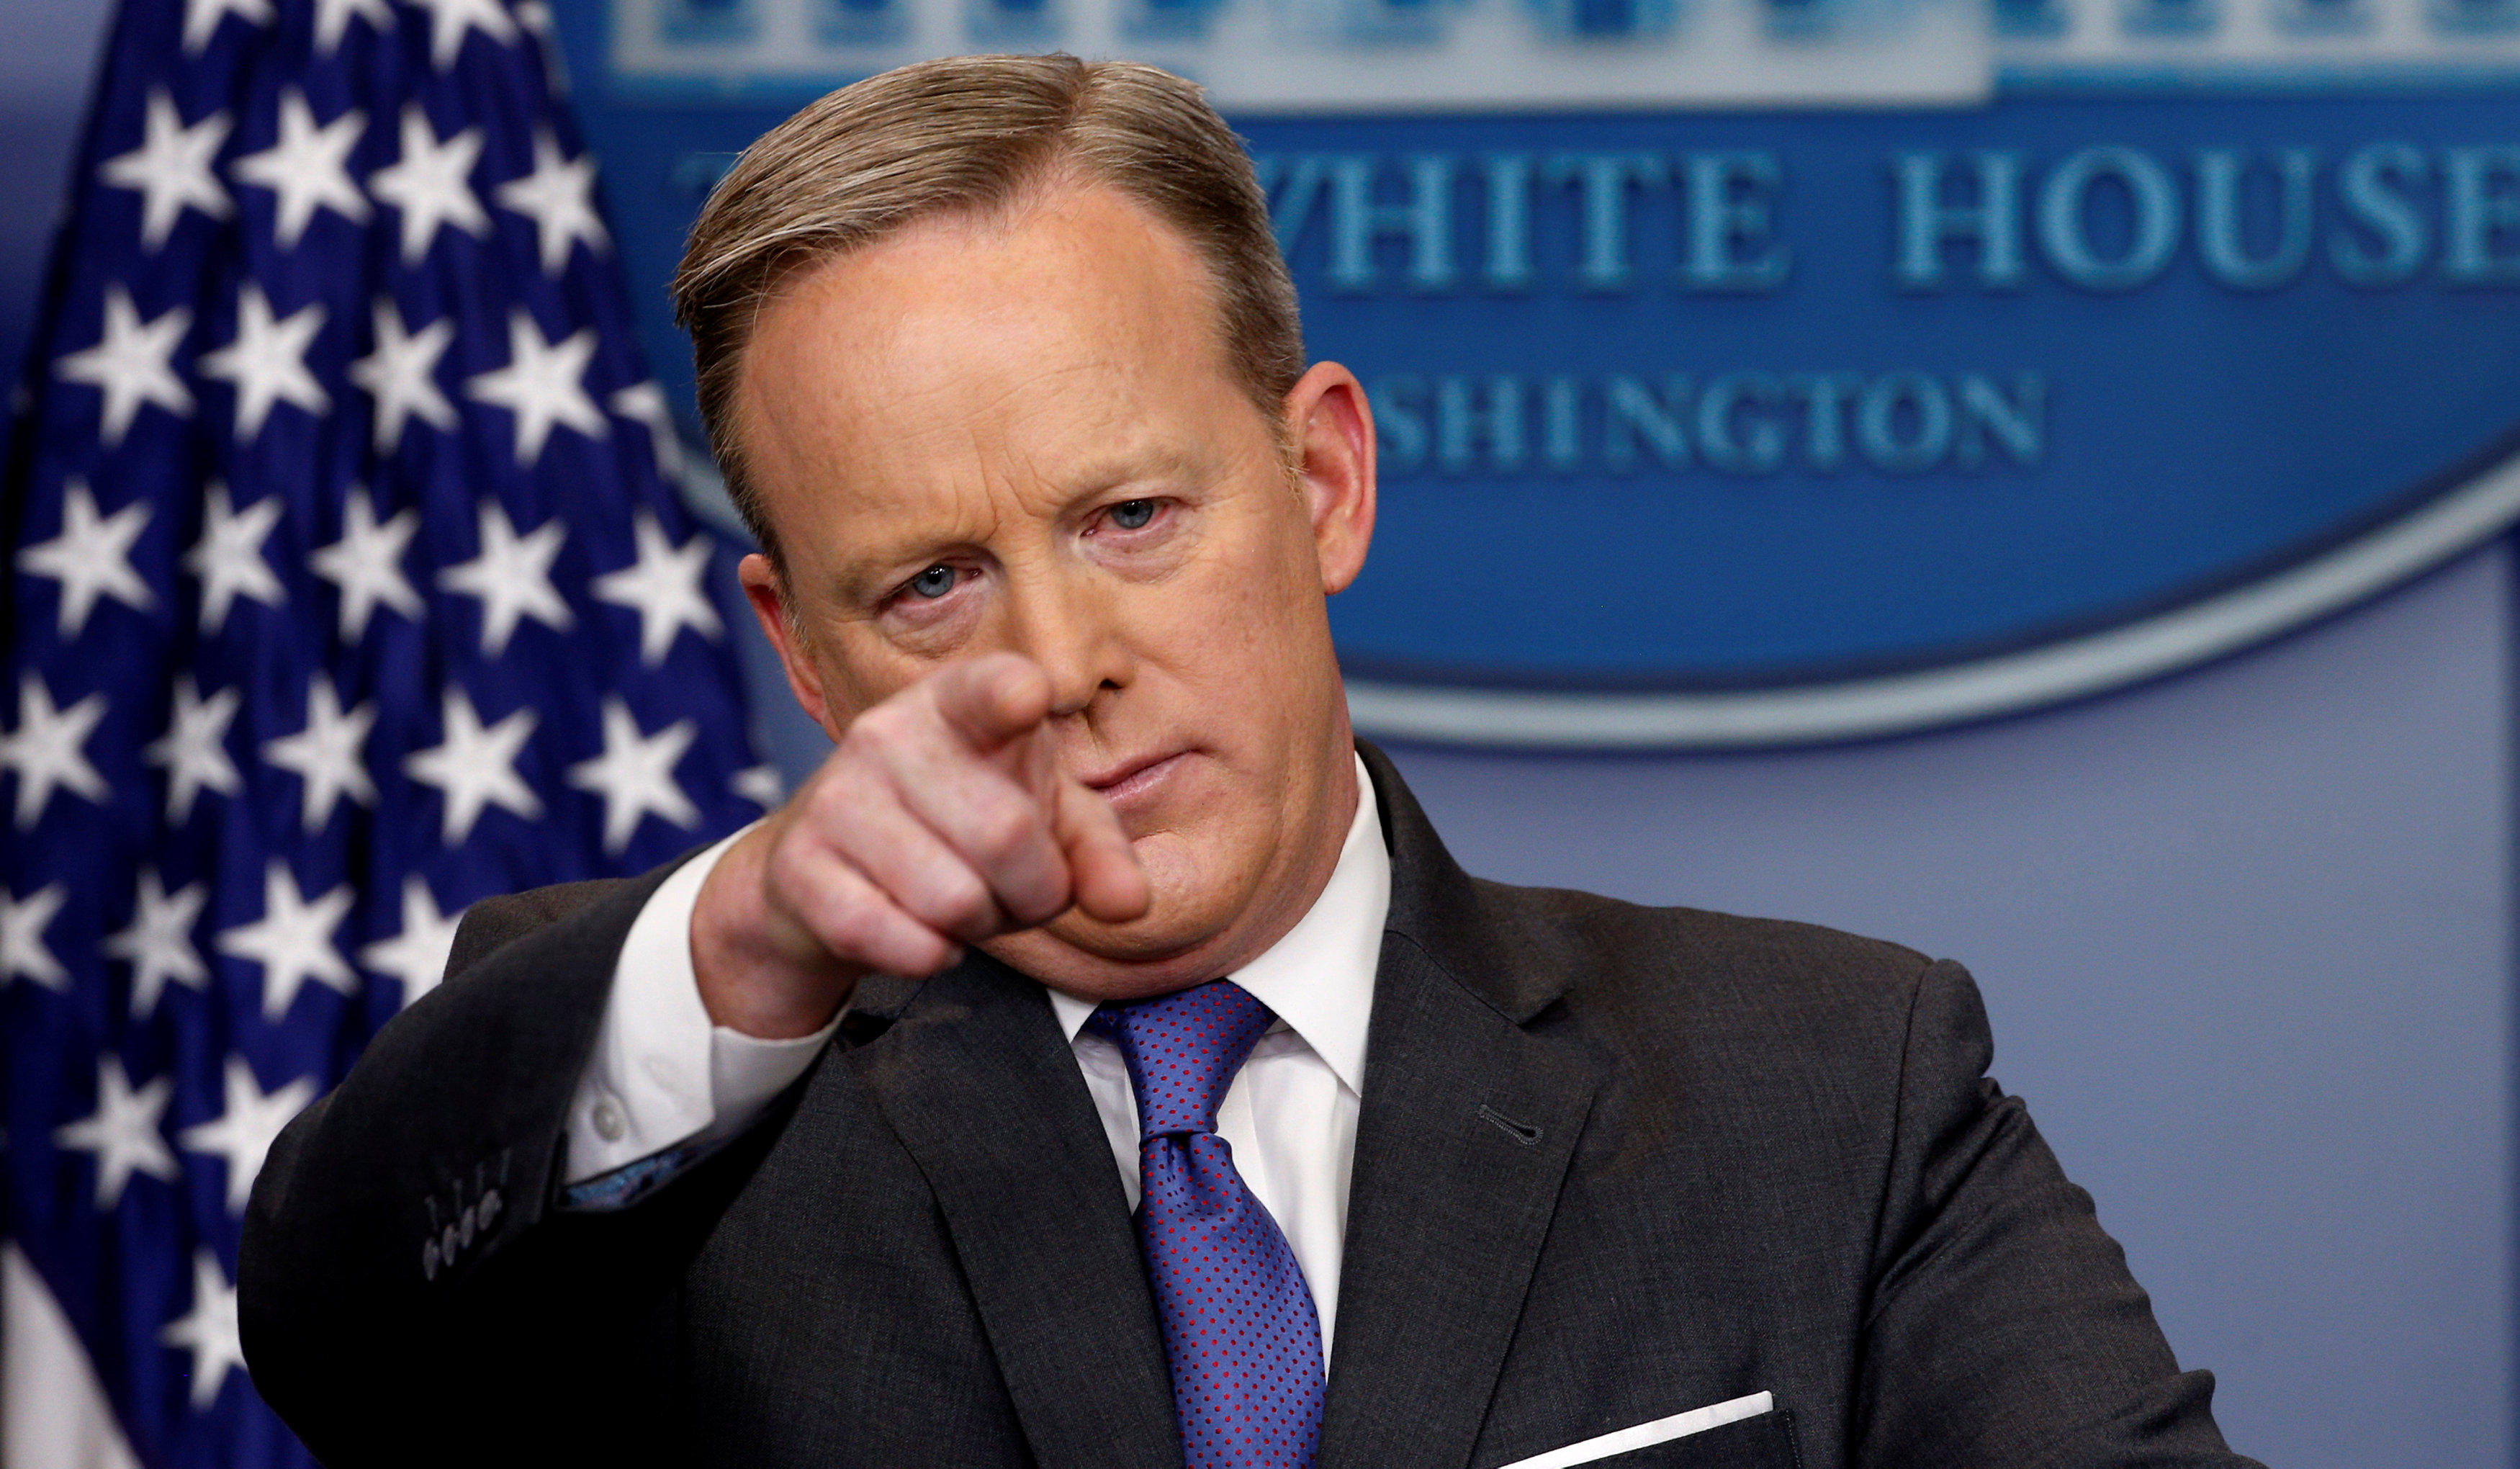 Sean Spicer press conference live updates - CBS News